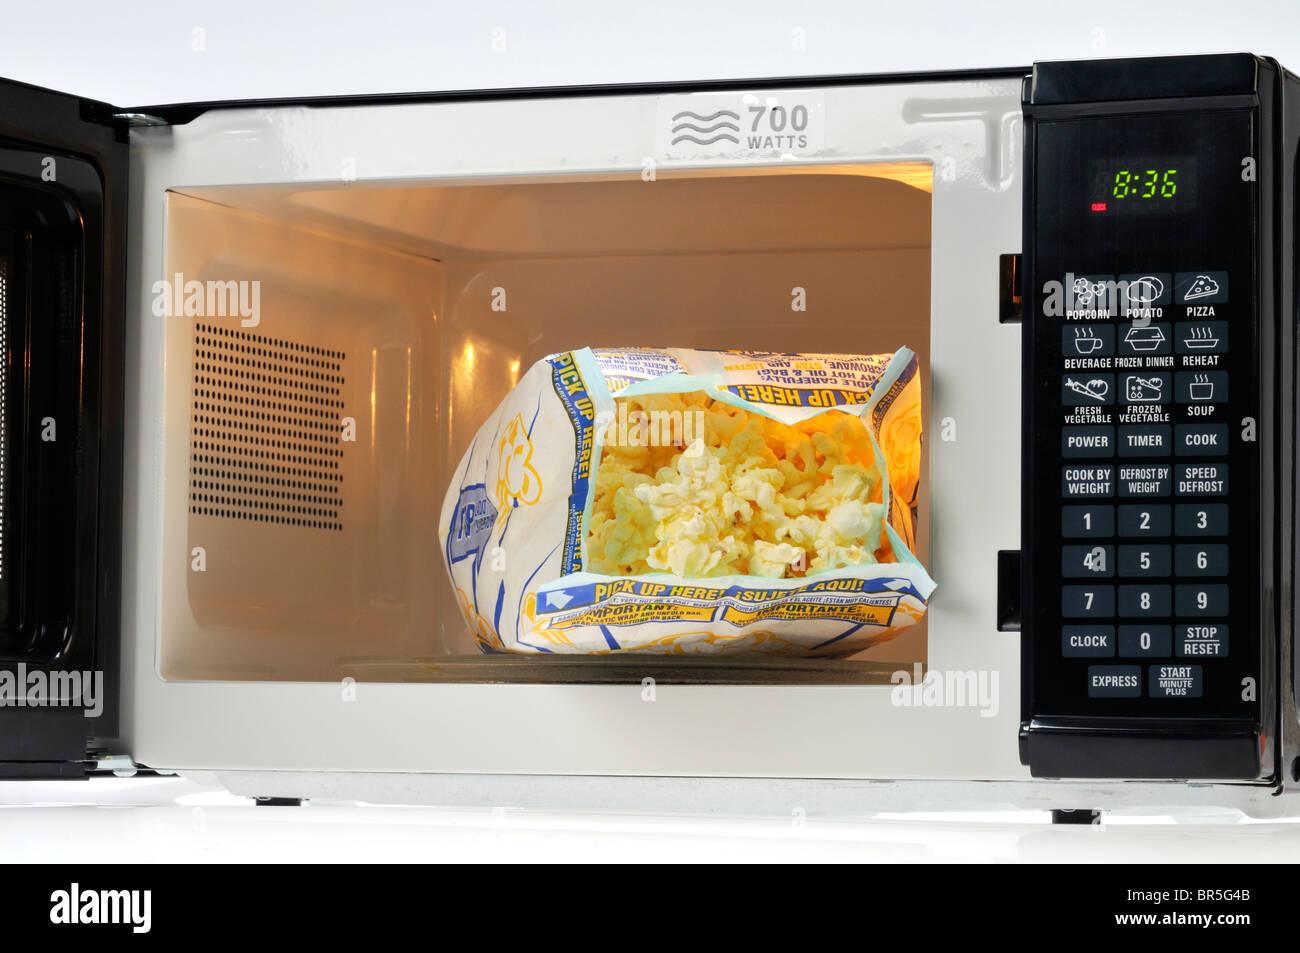 https www alamy com stock photo open bag of pop secret microwave popcorn in microwave oven usa 31469883 html